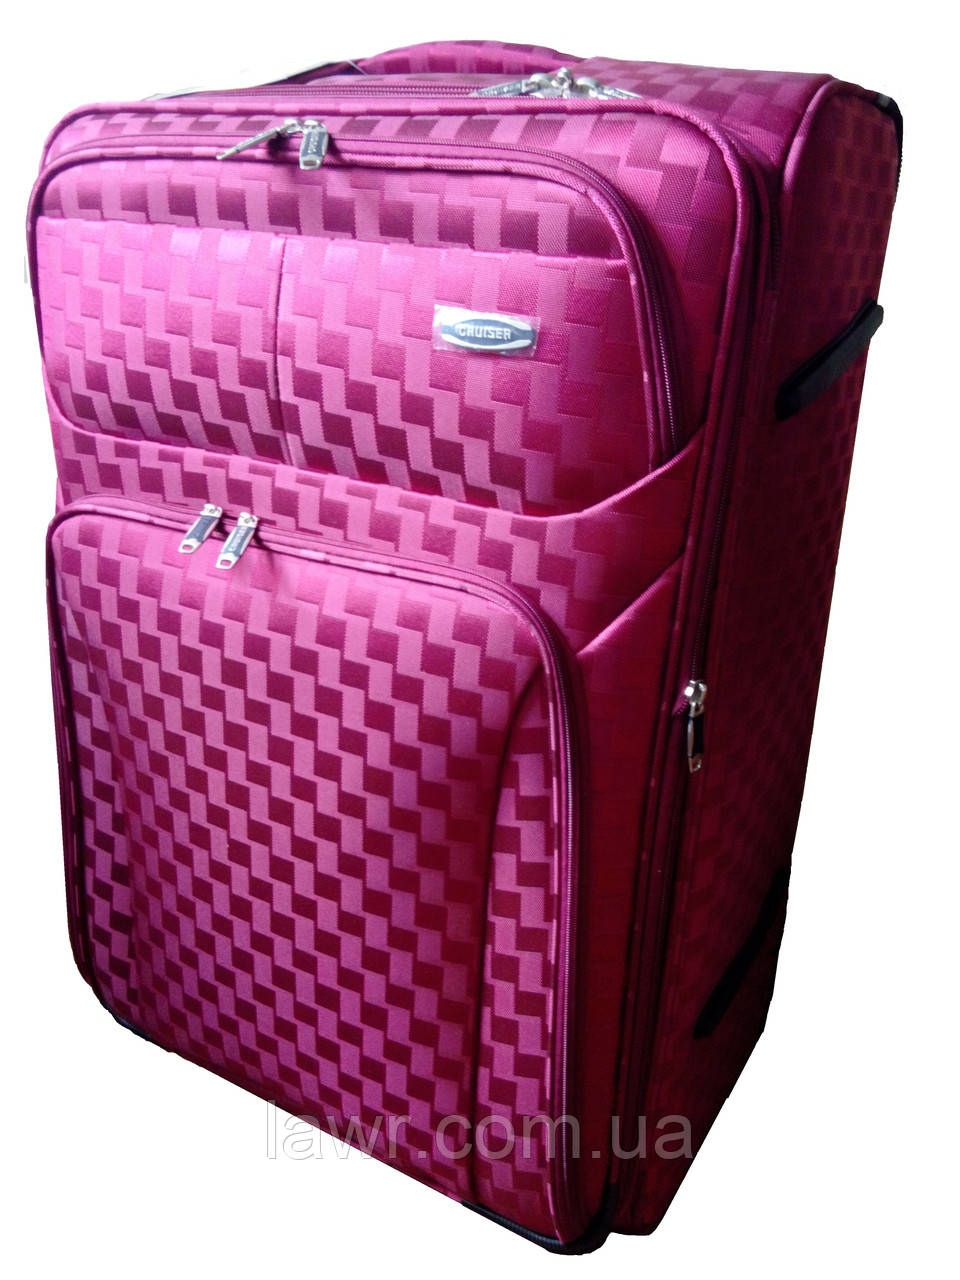 Круизер чемоданы seventeen kids рюкзаки